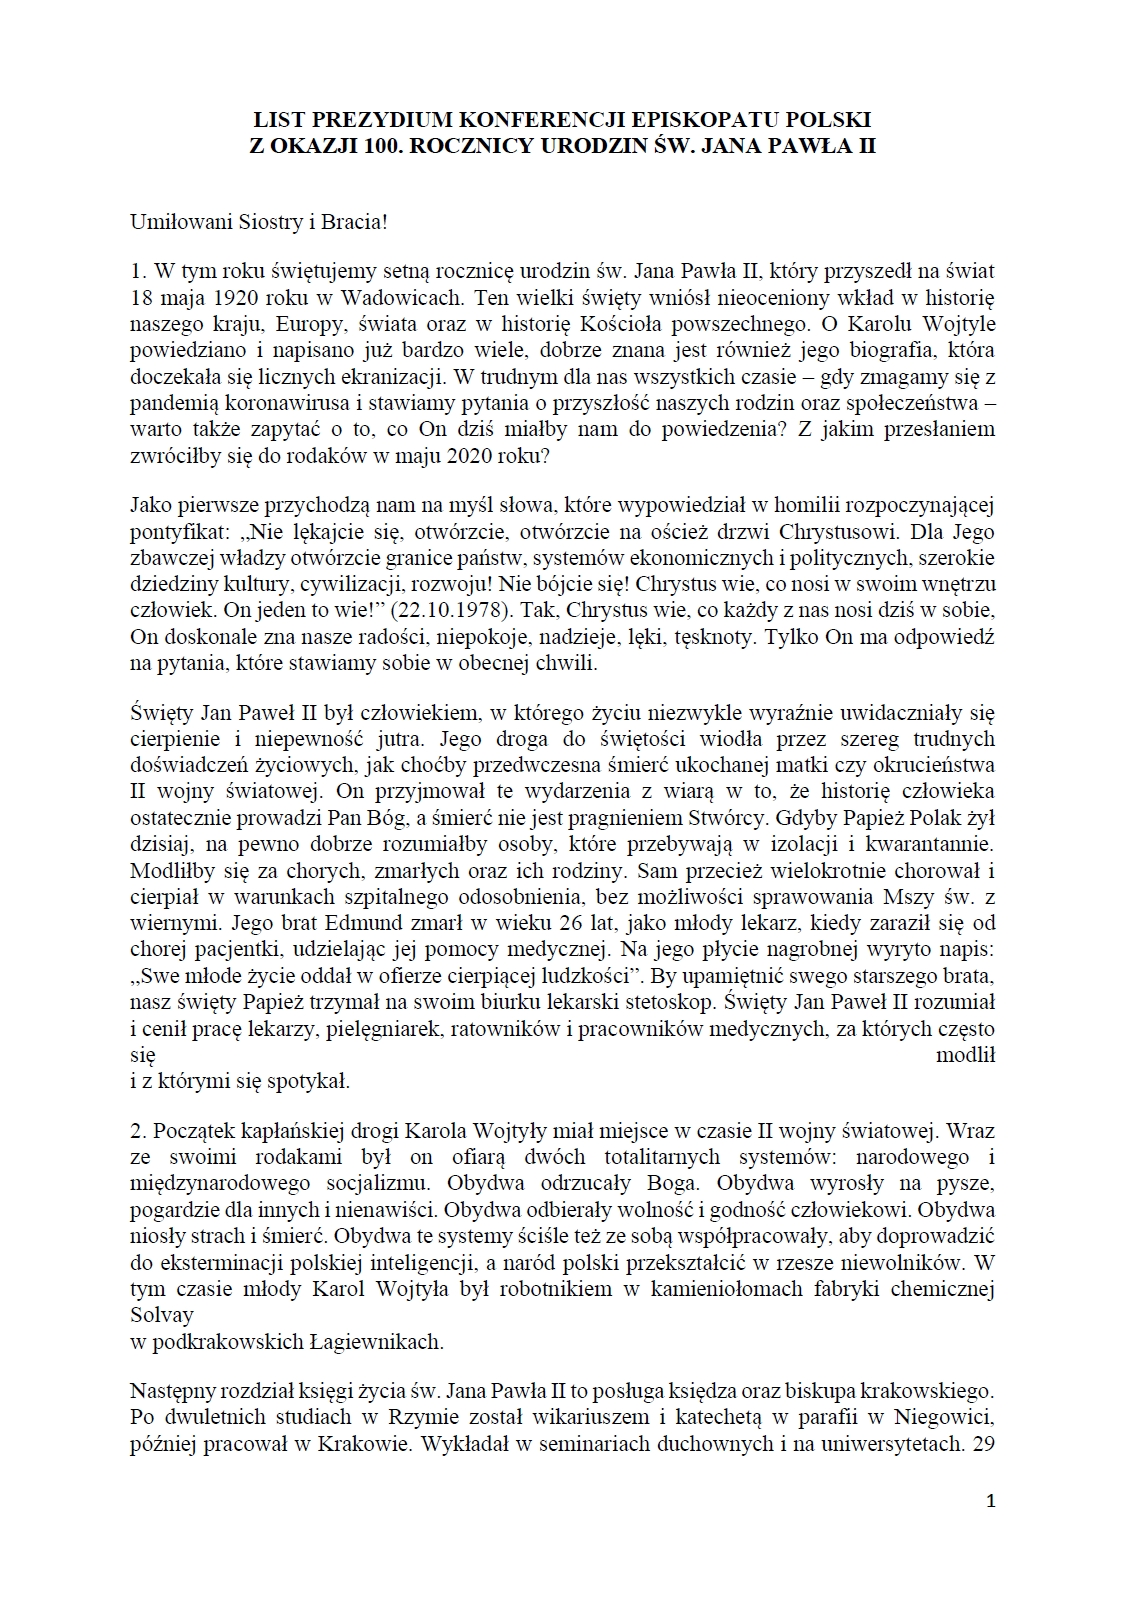 List str. 1